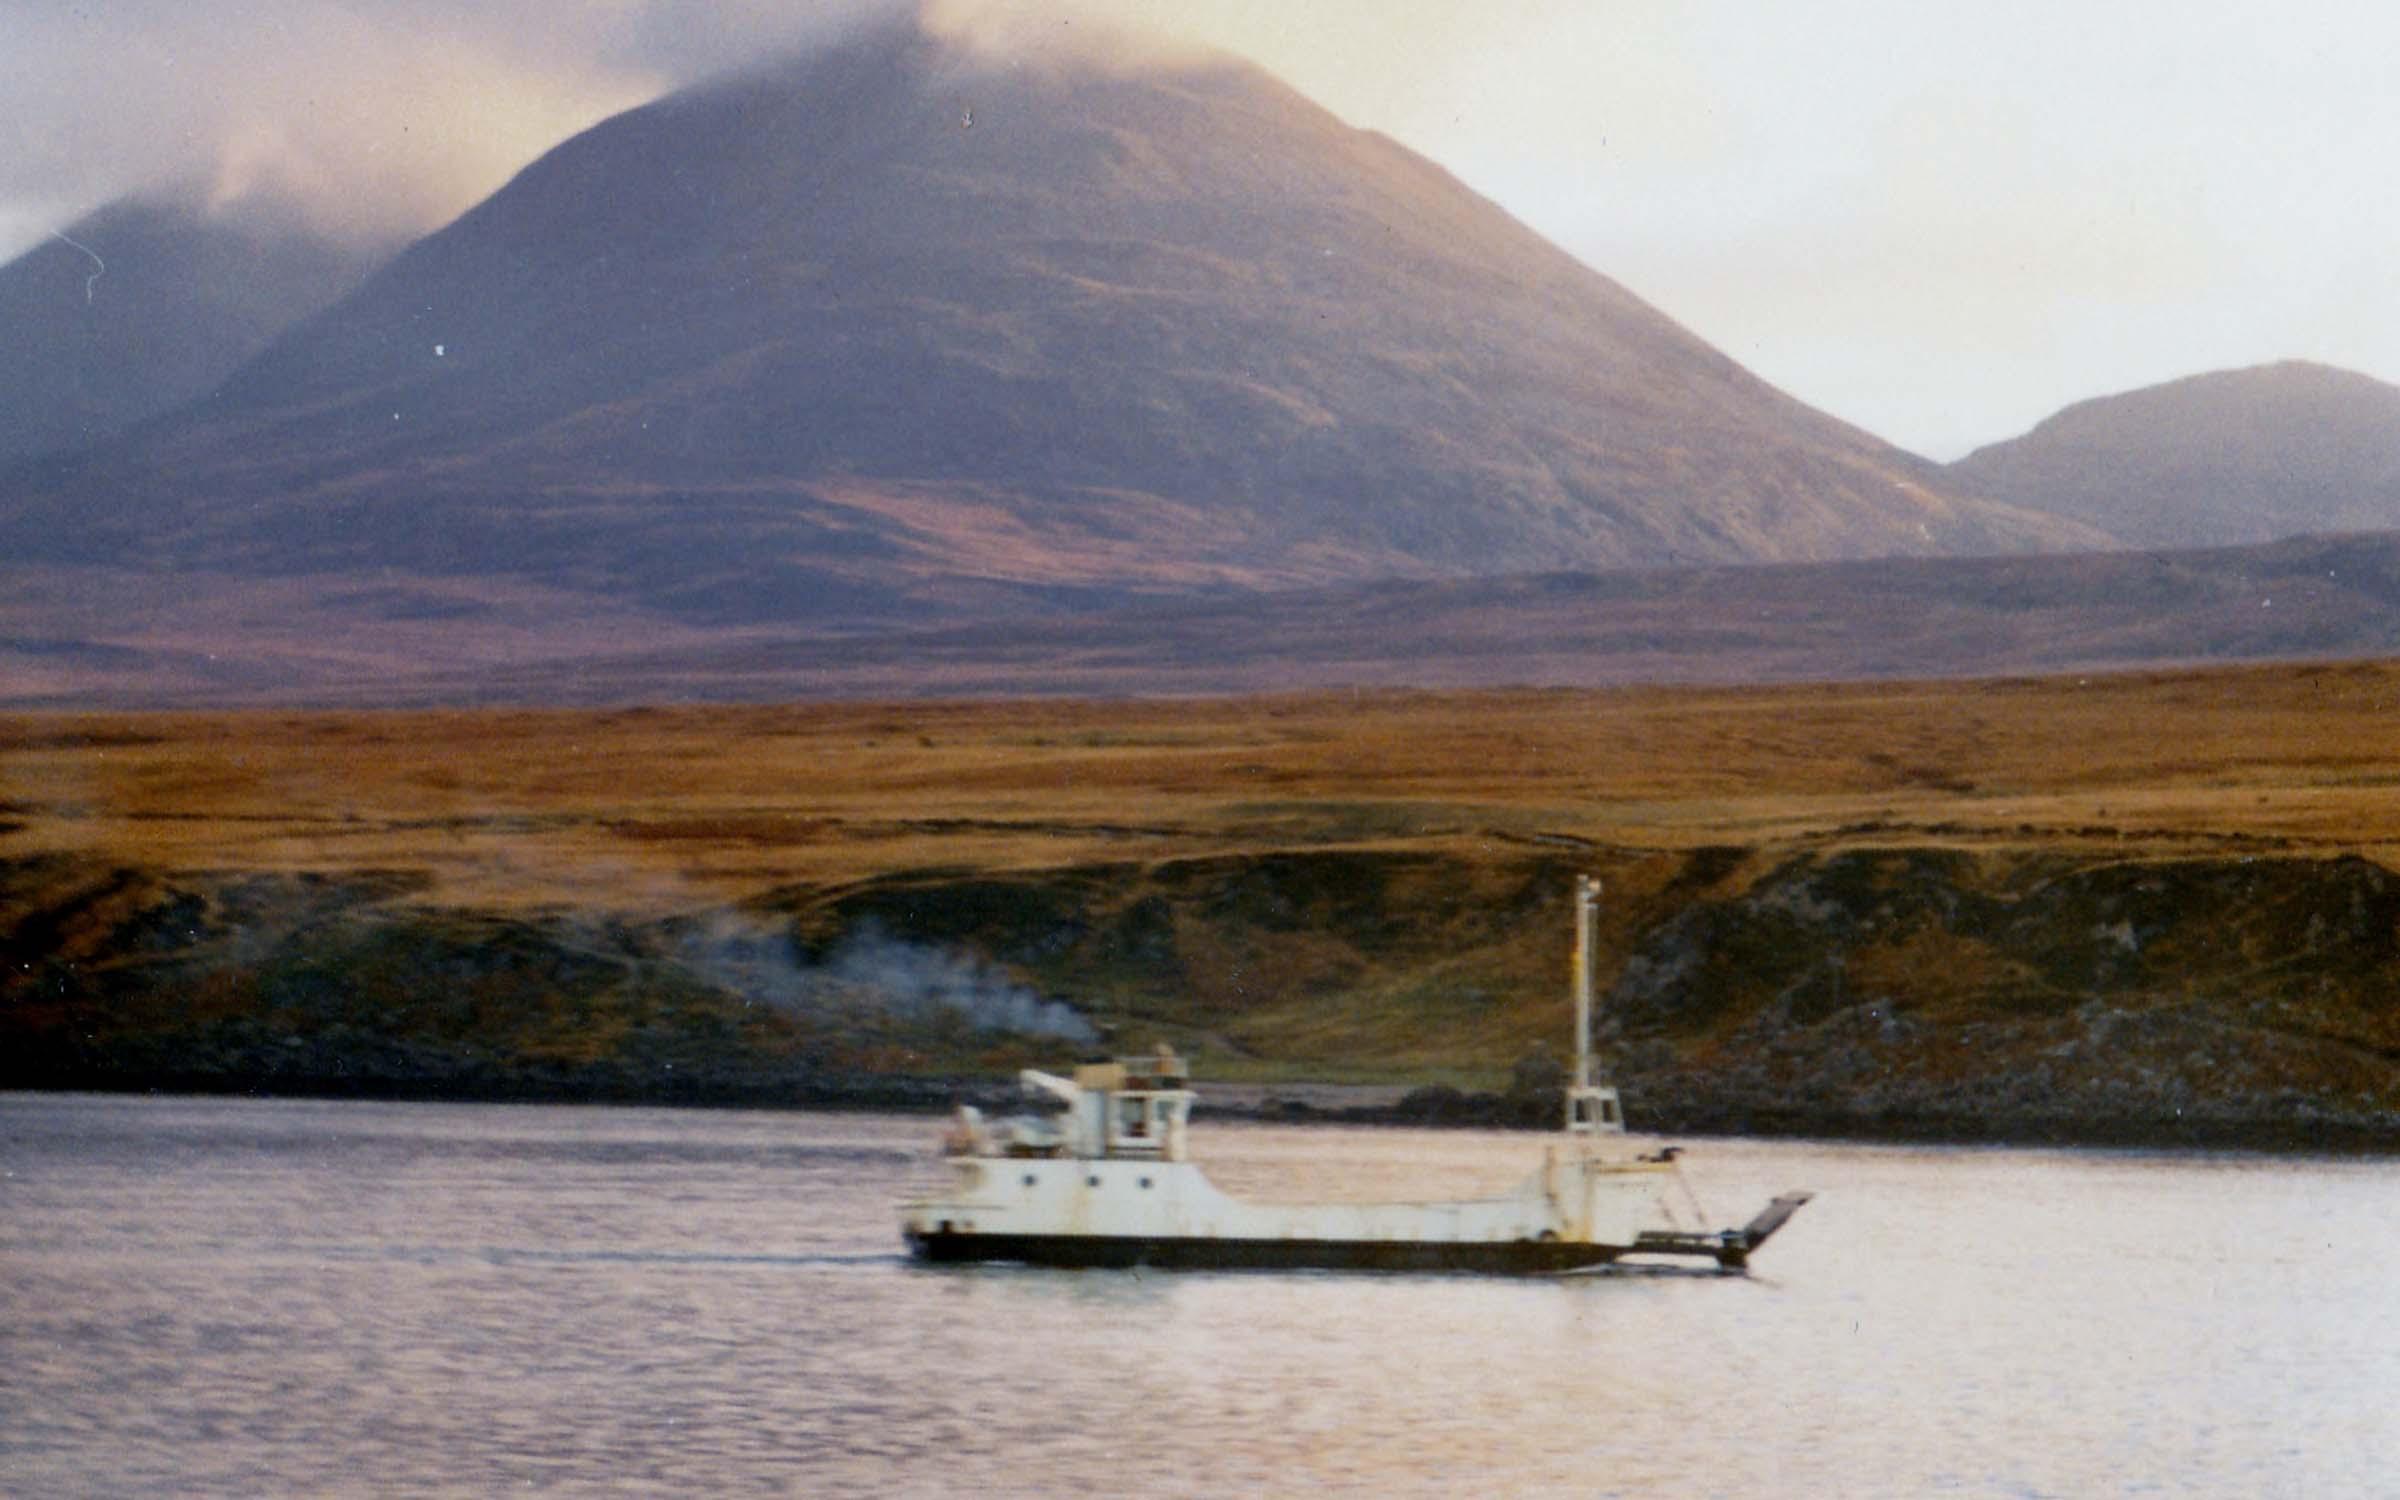 Kilbrannan in the Sound of Islay (Jim Aikman Smith)